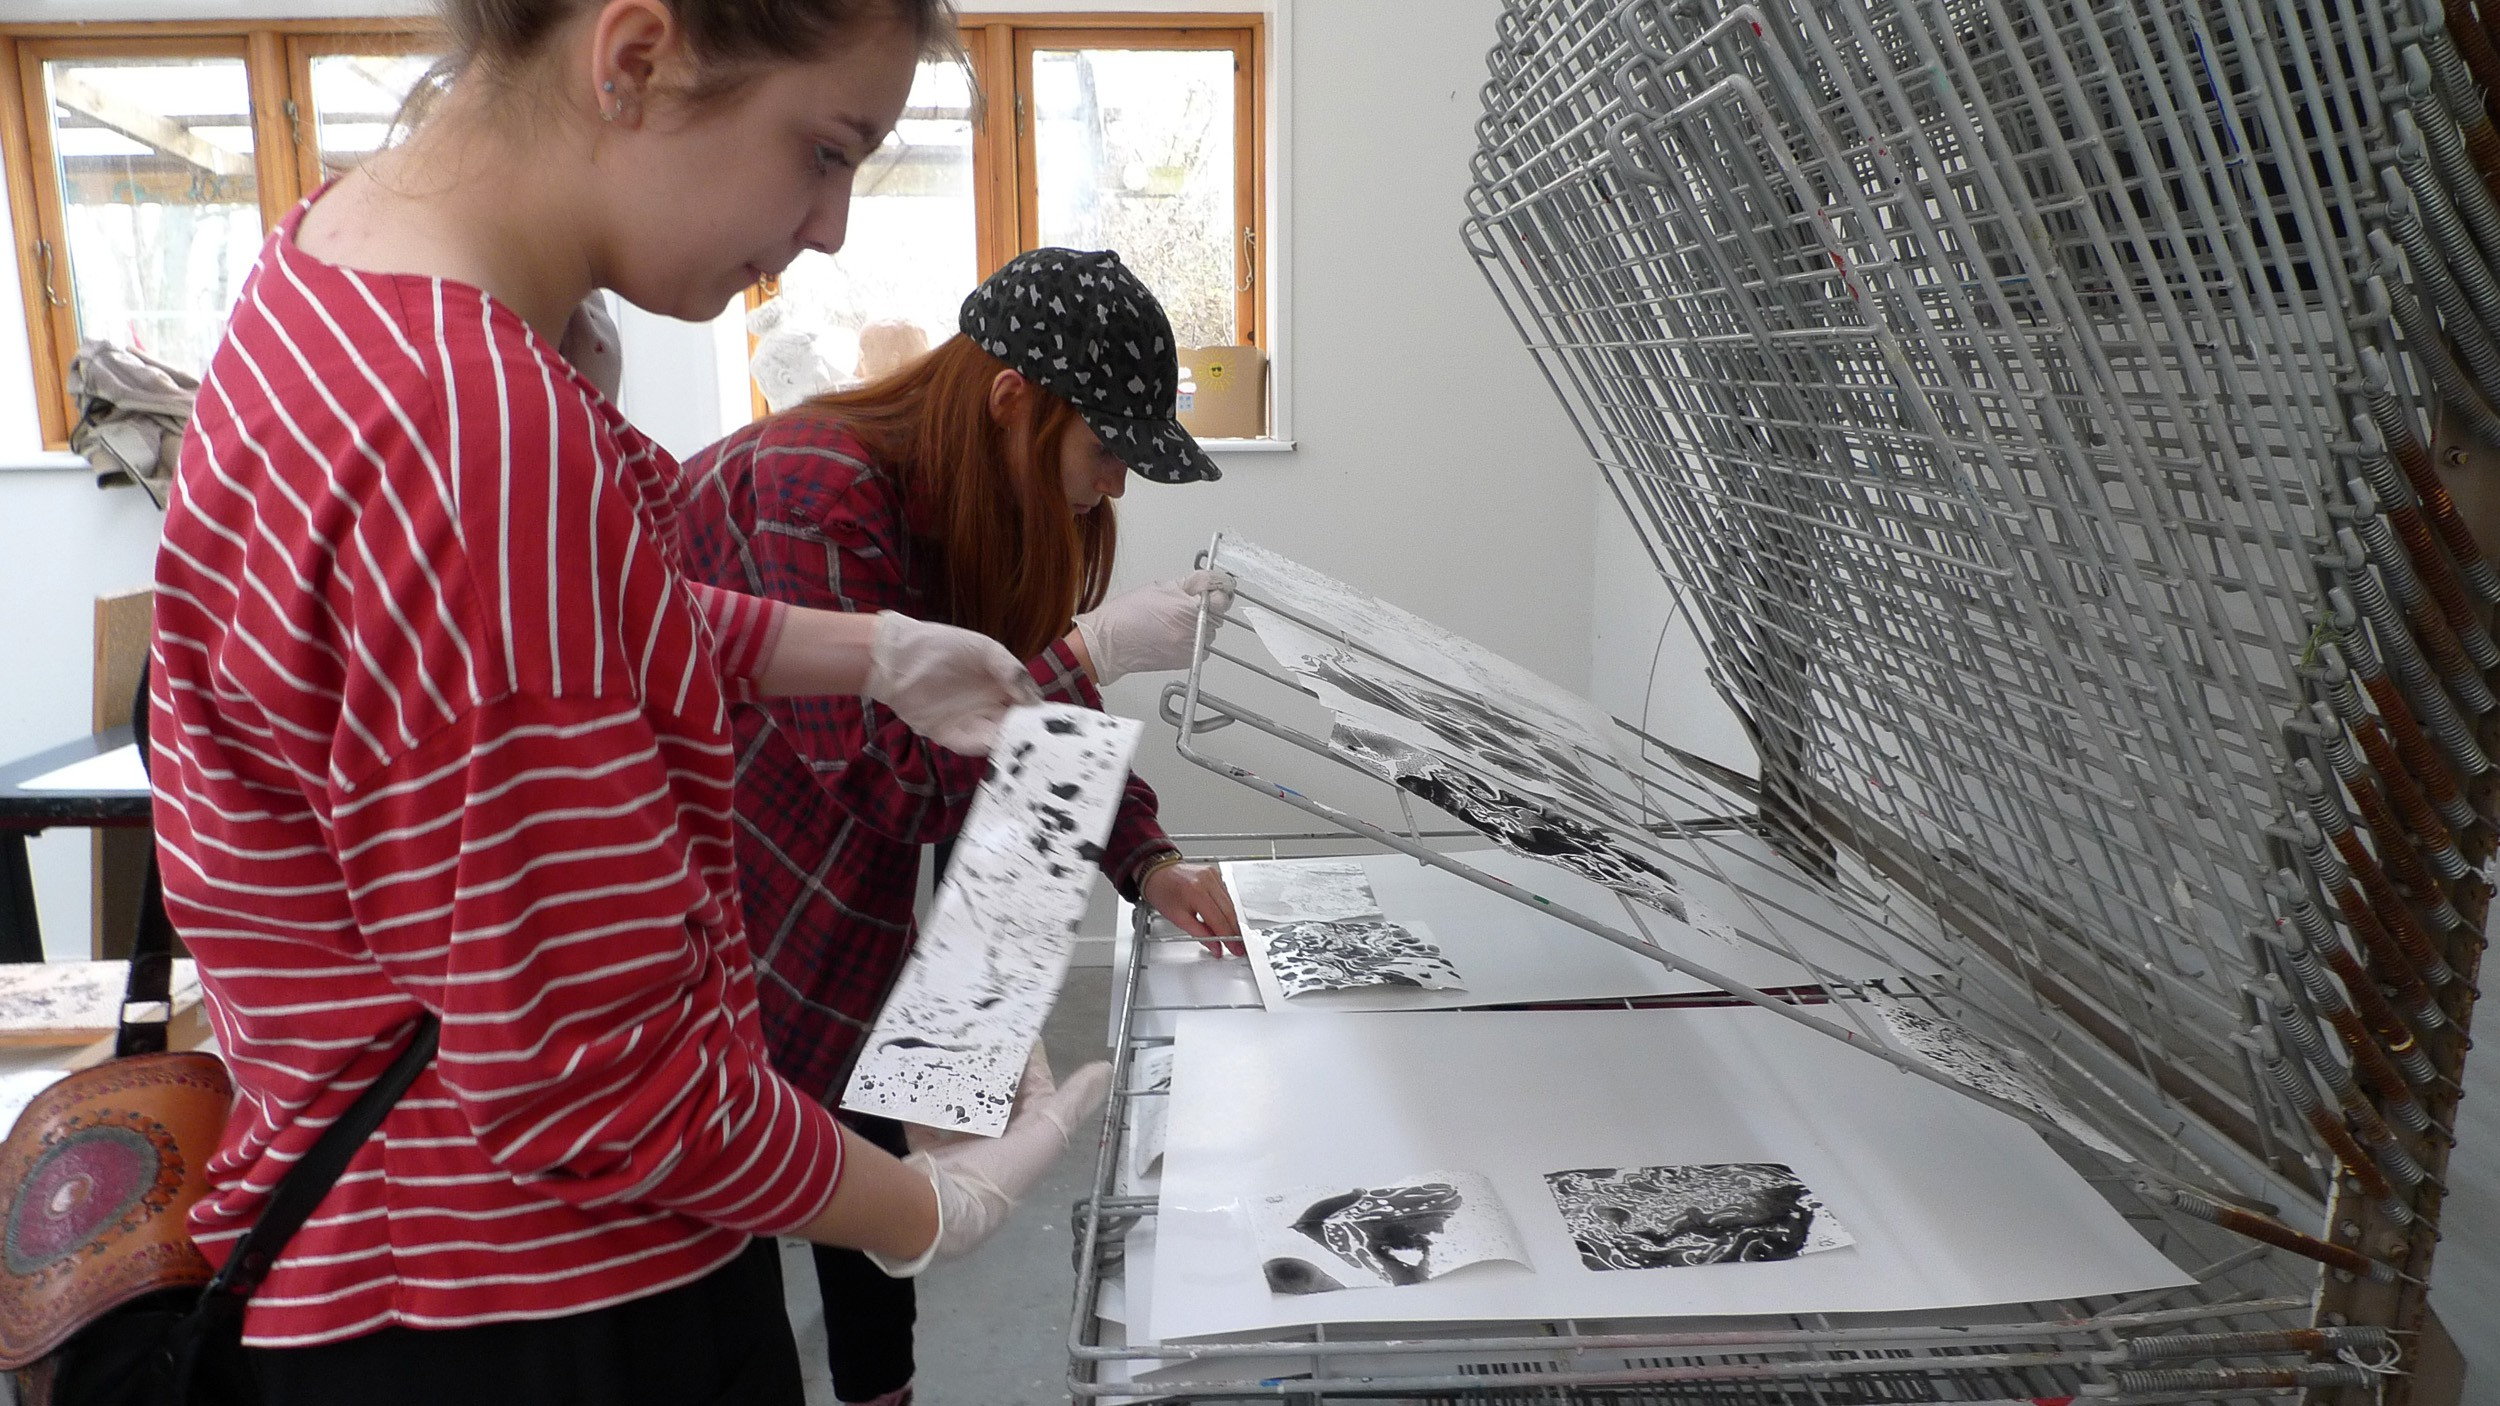 Marmorering workshop